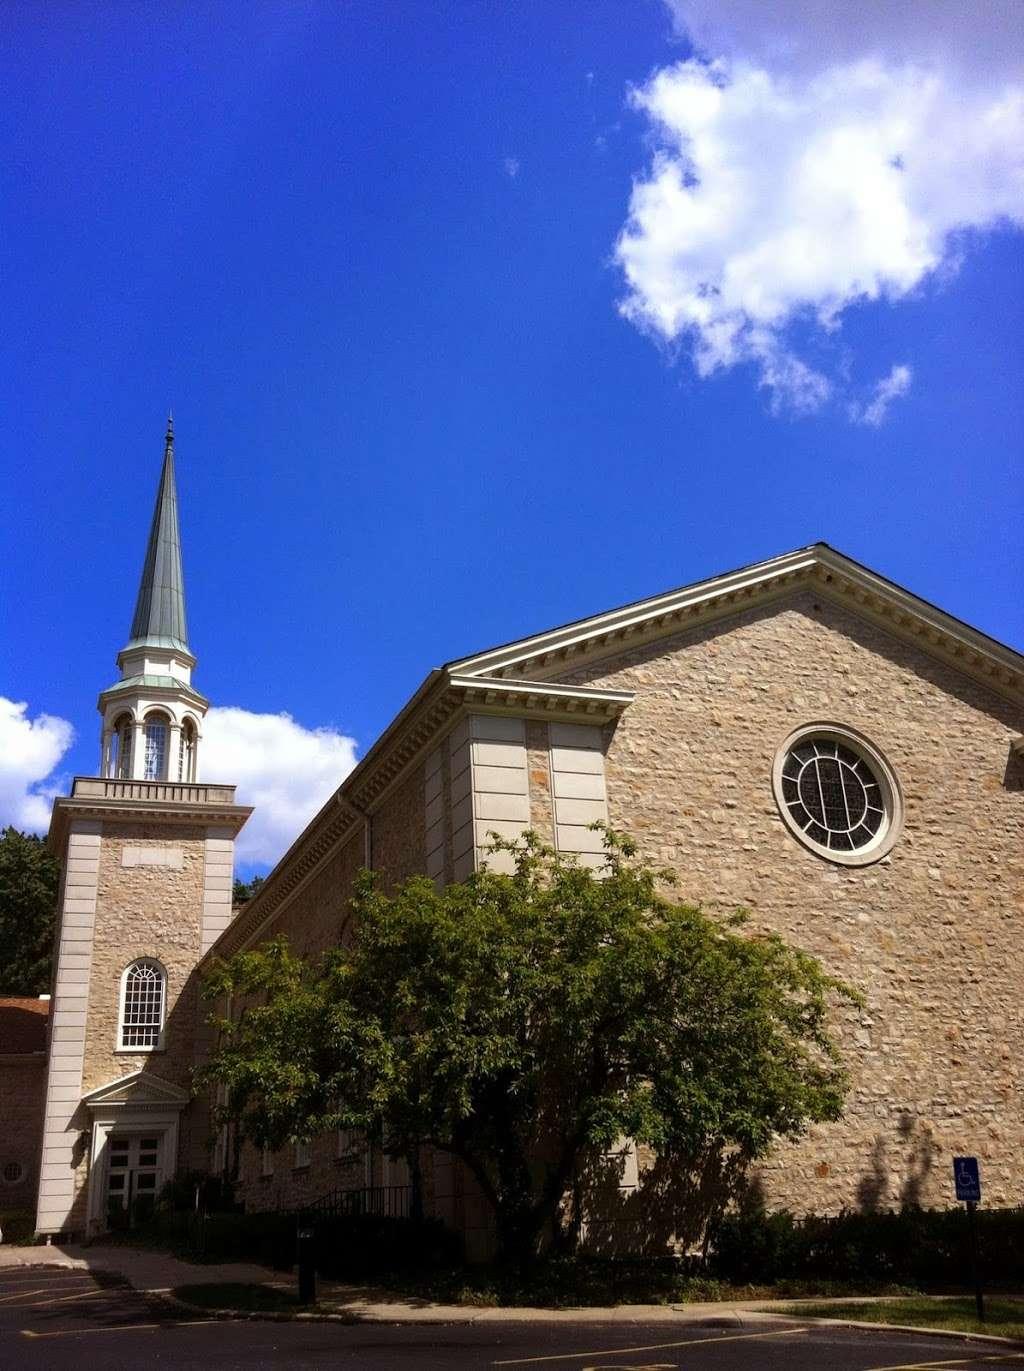 Old Mission United Methodist Church - church    Photo 2 of 7   Address: 5519 State Park Rd, Fairway, KS 66205, USA   Phone: (913) 262-1040